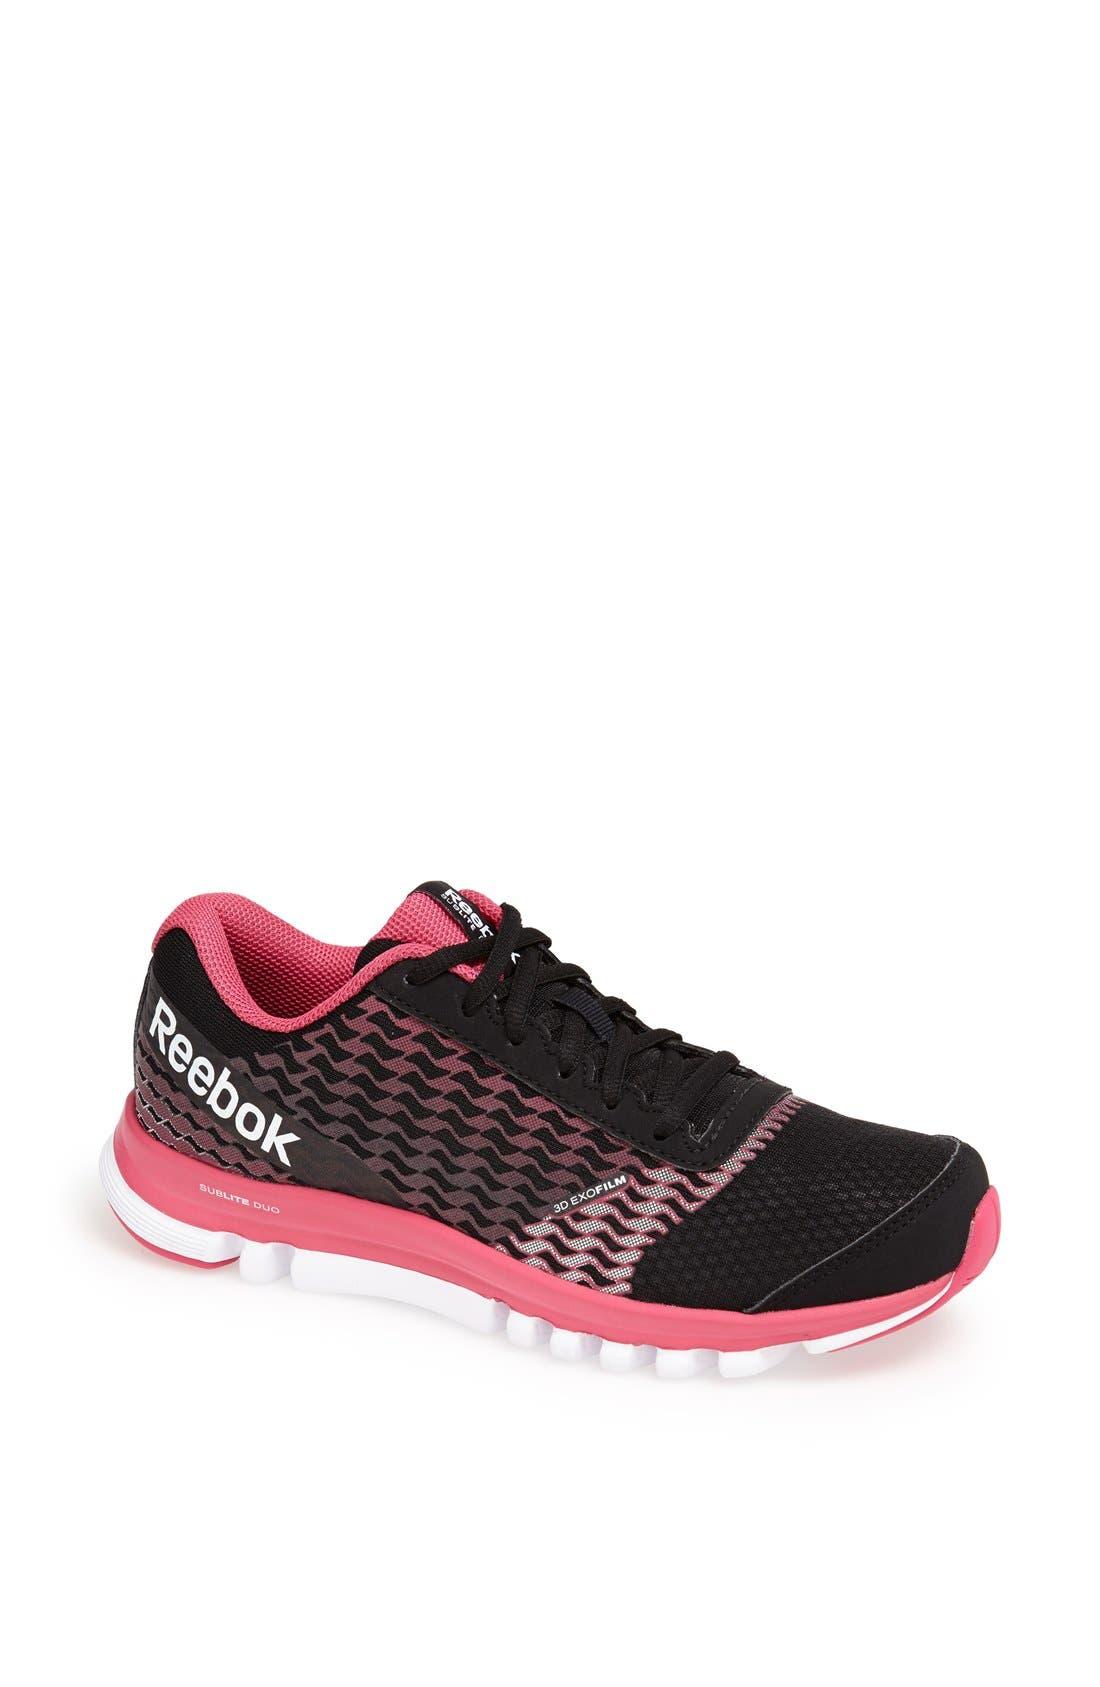 Alternate Image 1 Selected - Reebok 'SubLite Duo Instinct' Running Shoe (Women)